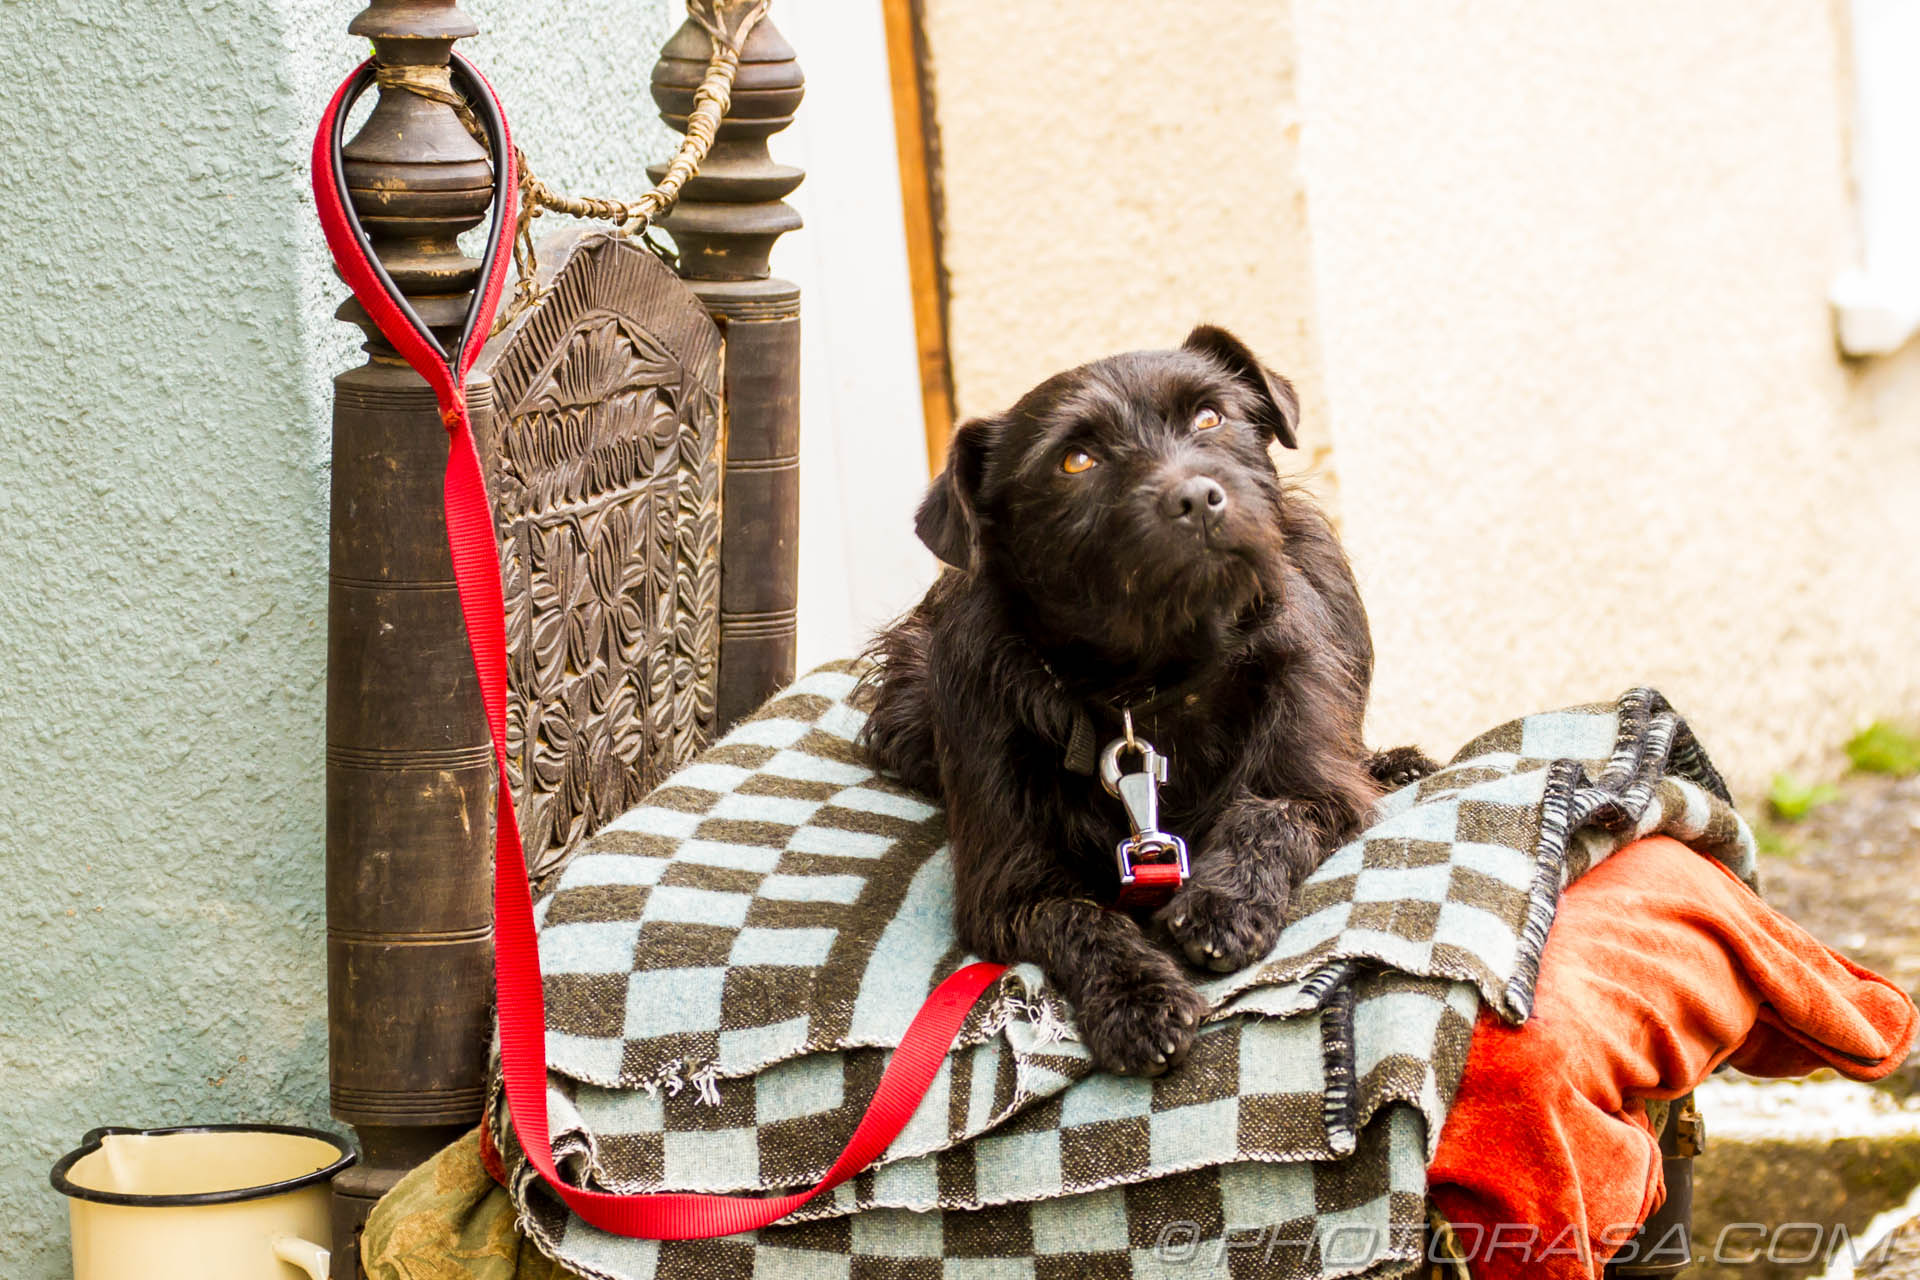 https://photorasa.com/princely-terrier/looking-up/